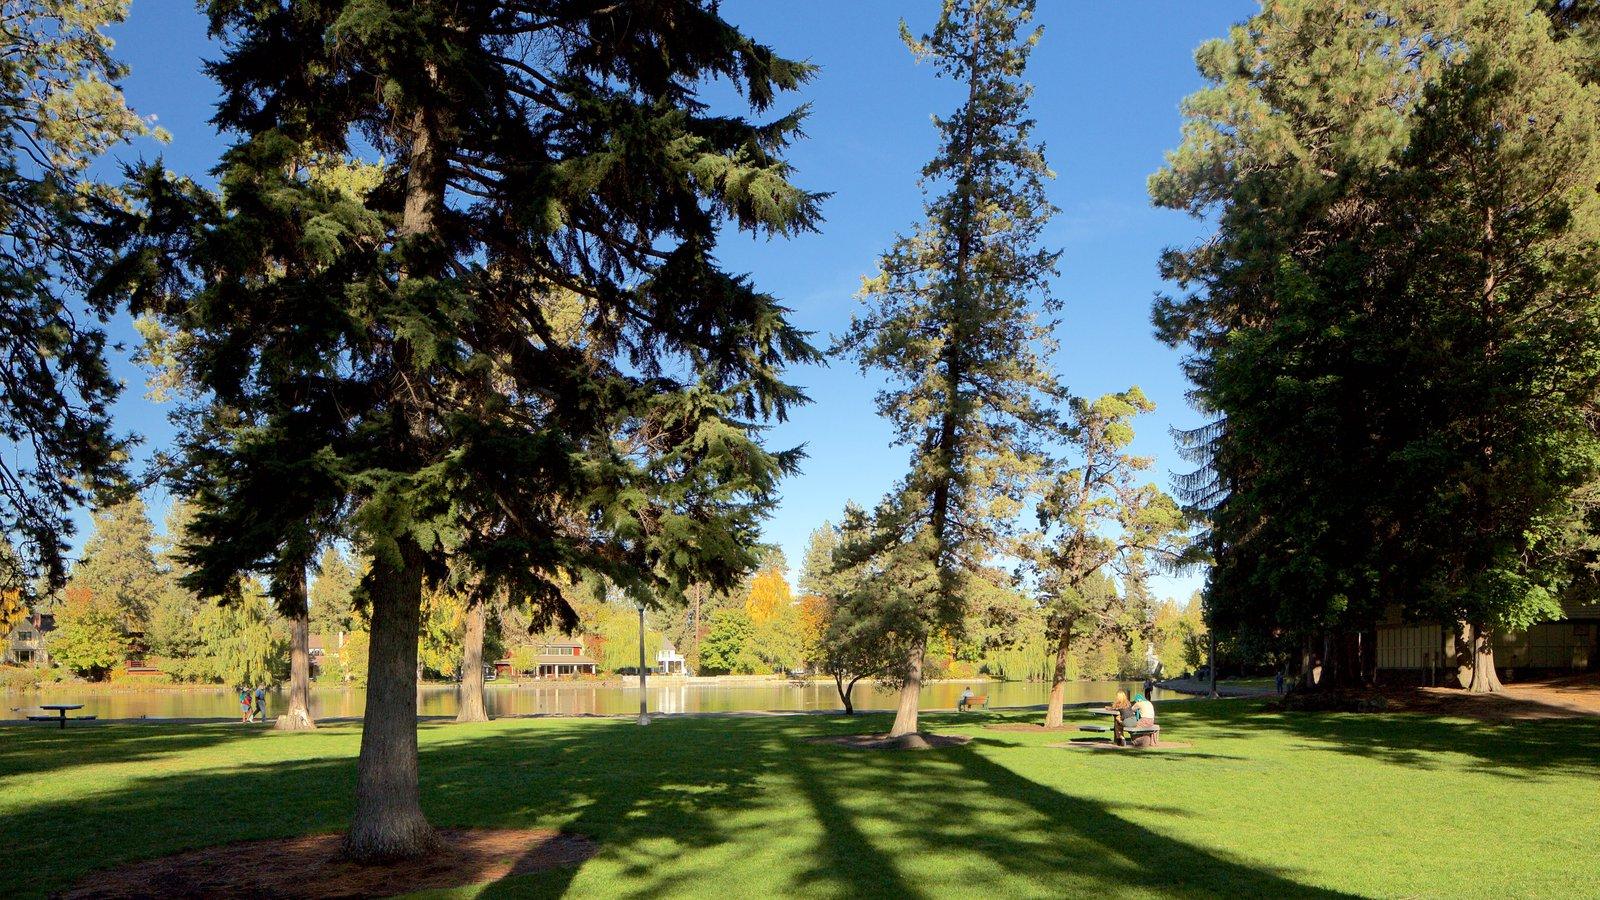 Drake Park mostrando un jardín